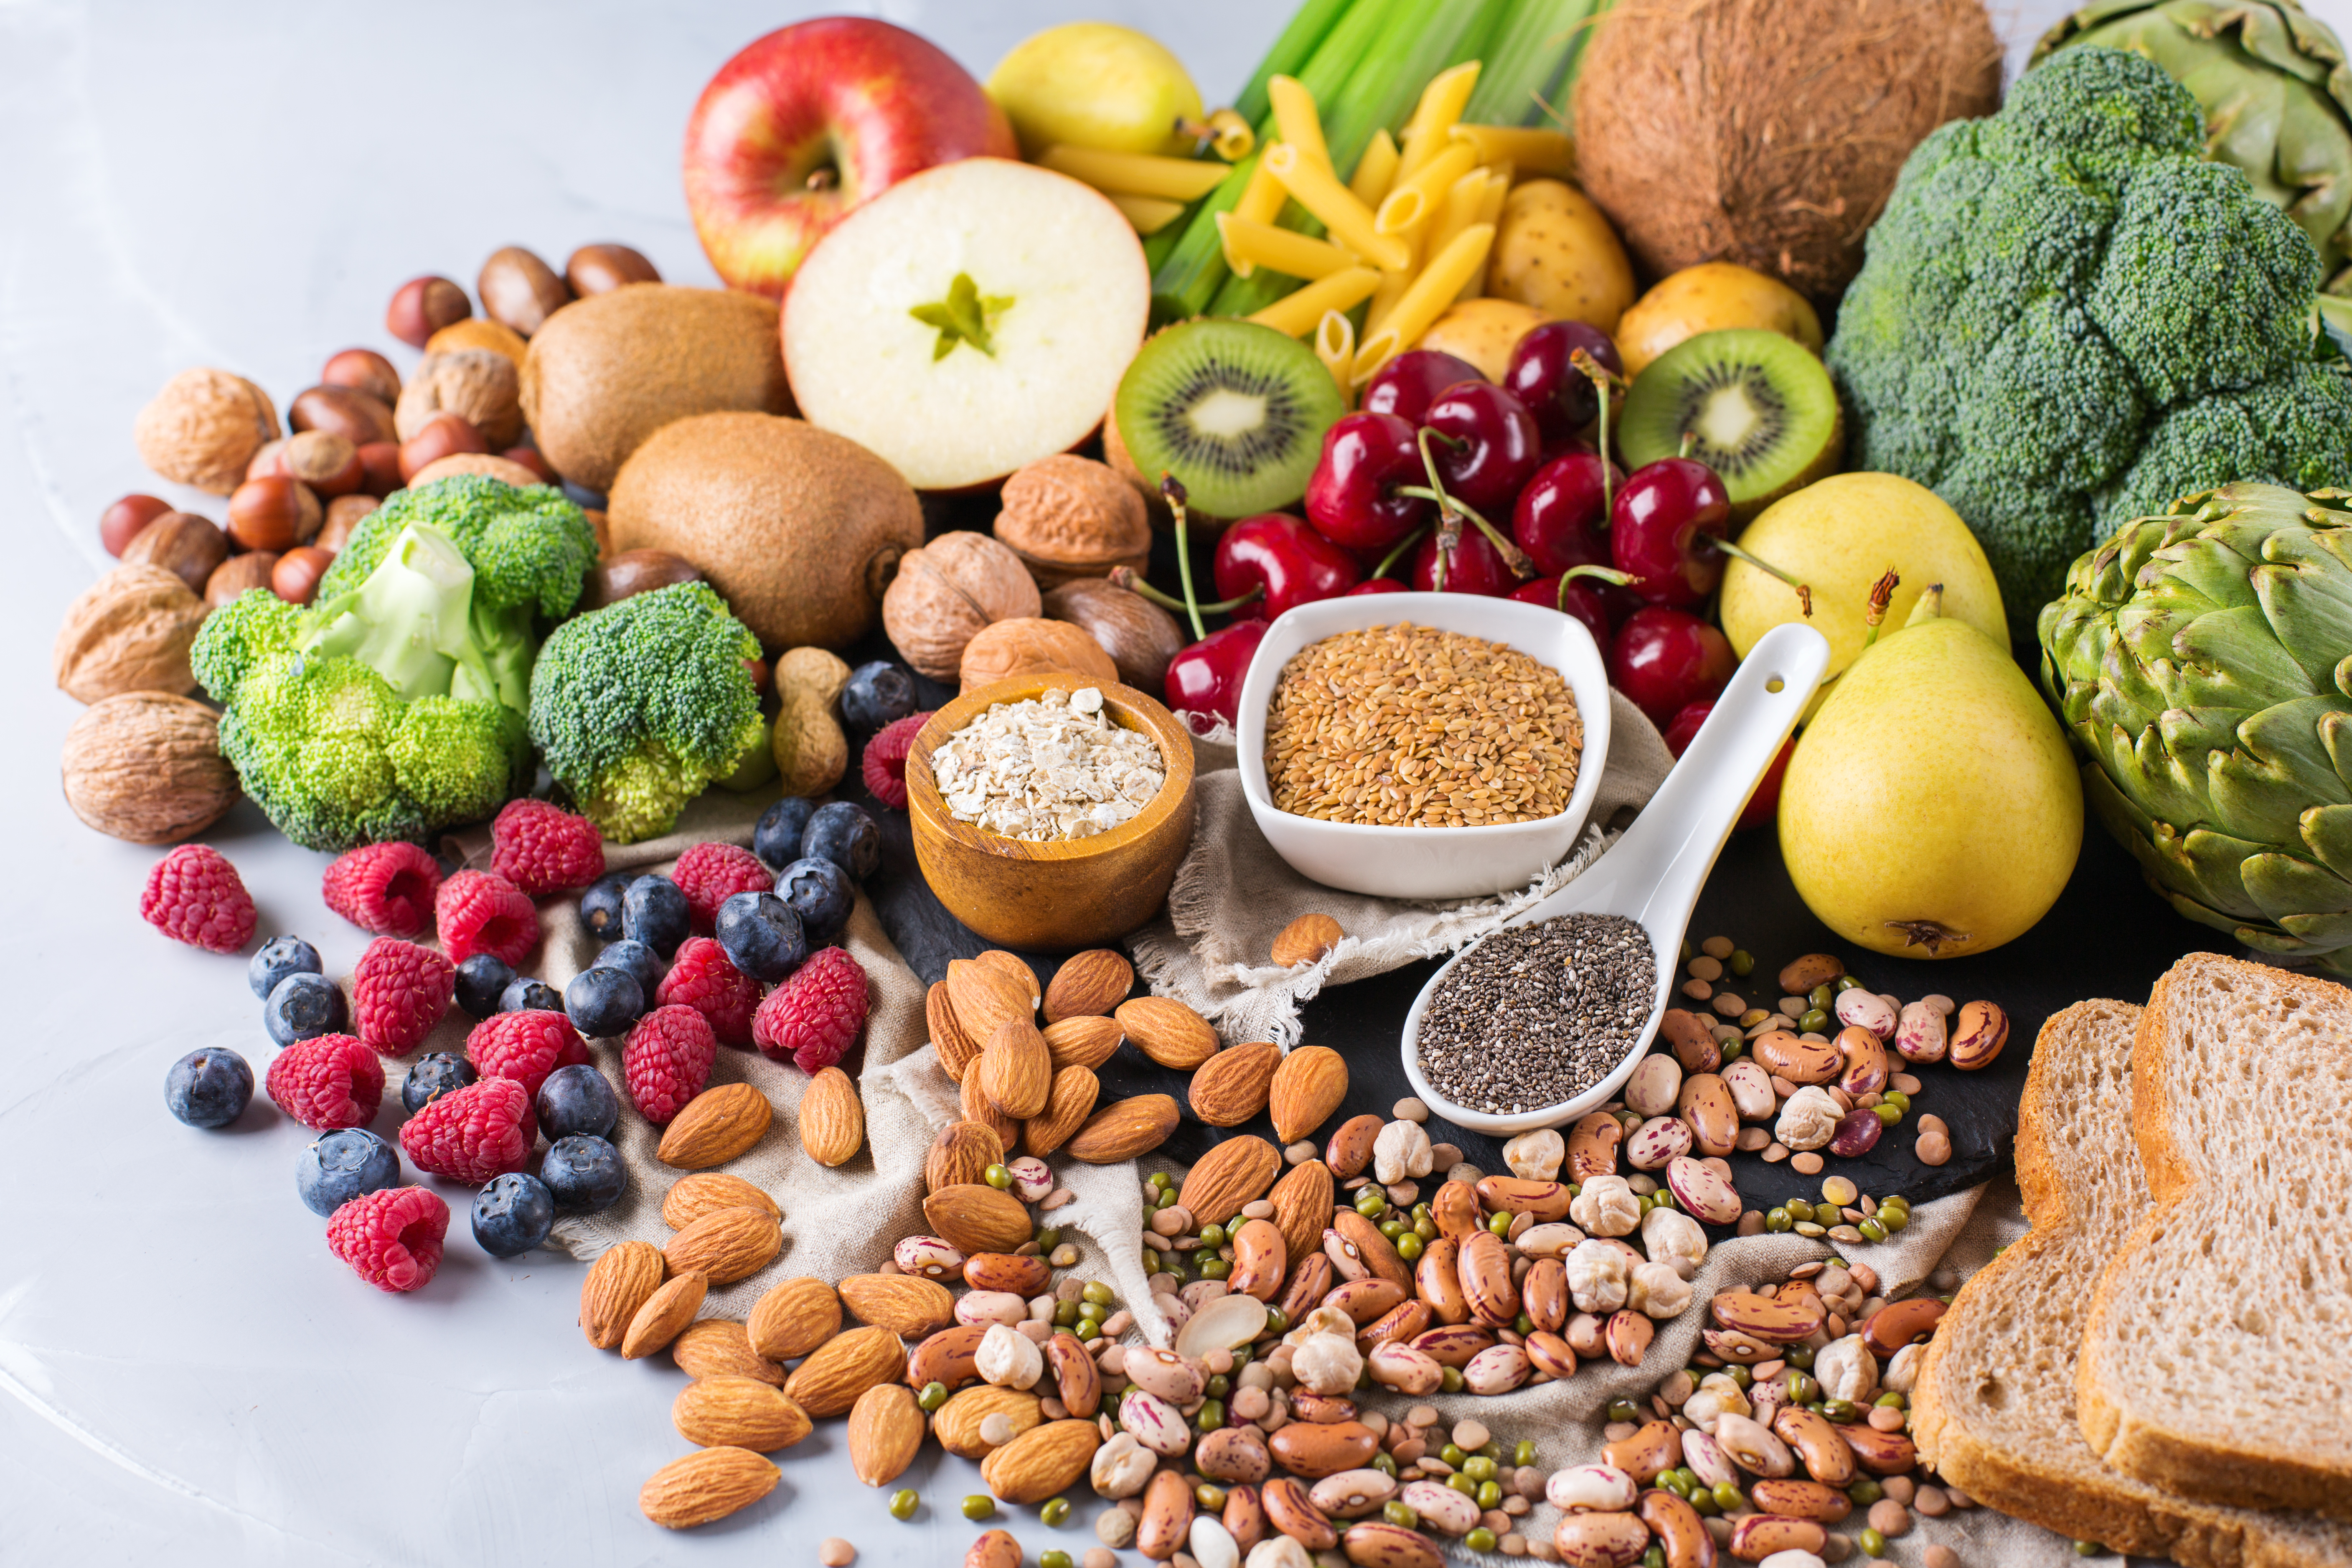 how to add fiber to leachie diet